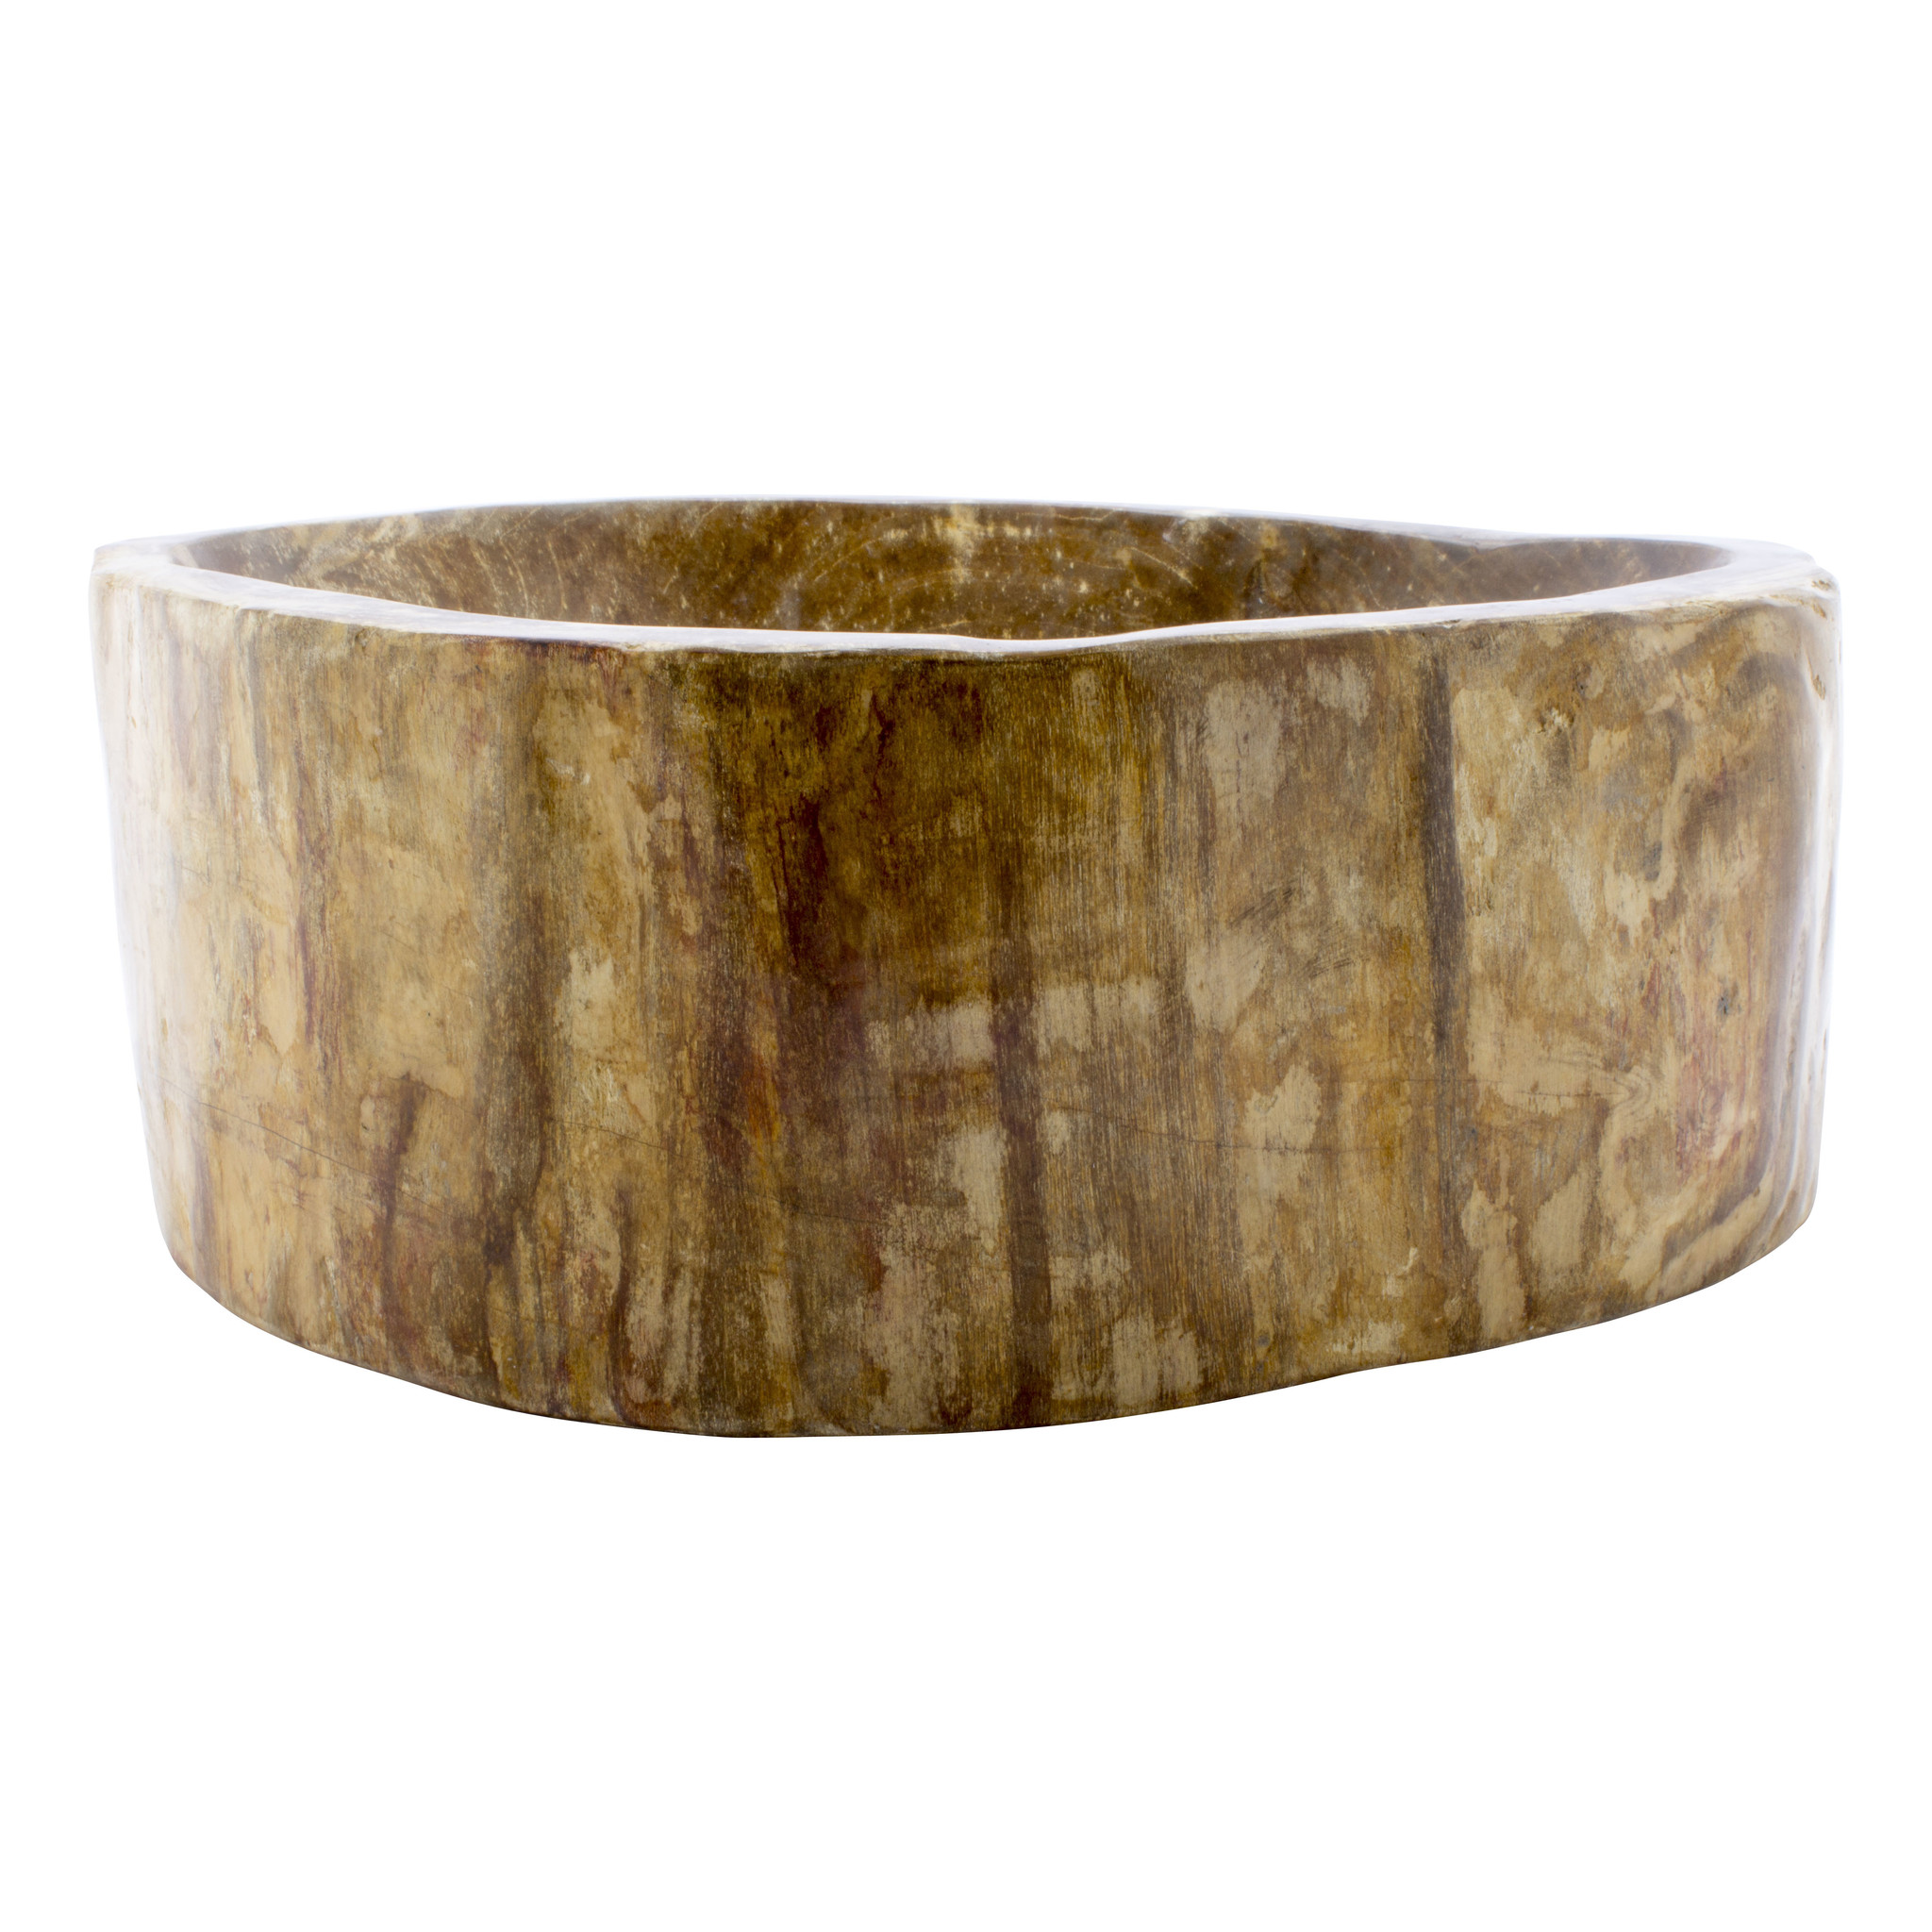 Indomarmer Polished Wash Bowl of Petrified Wood 40x33x15cm